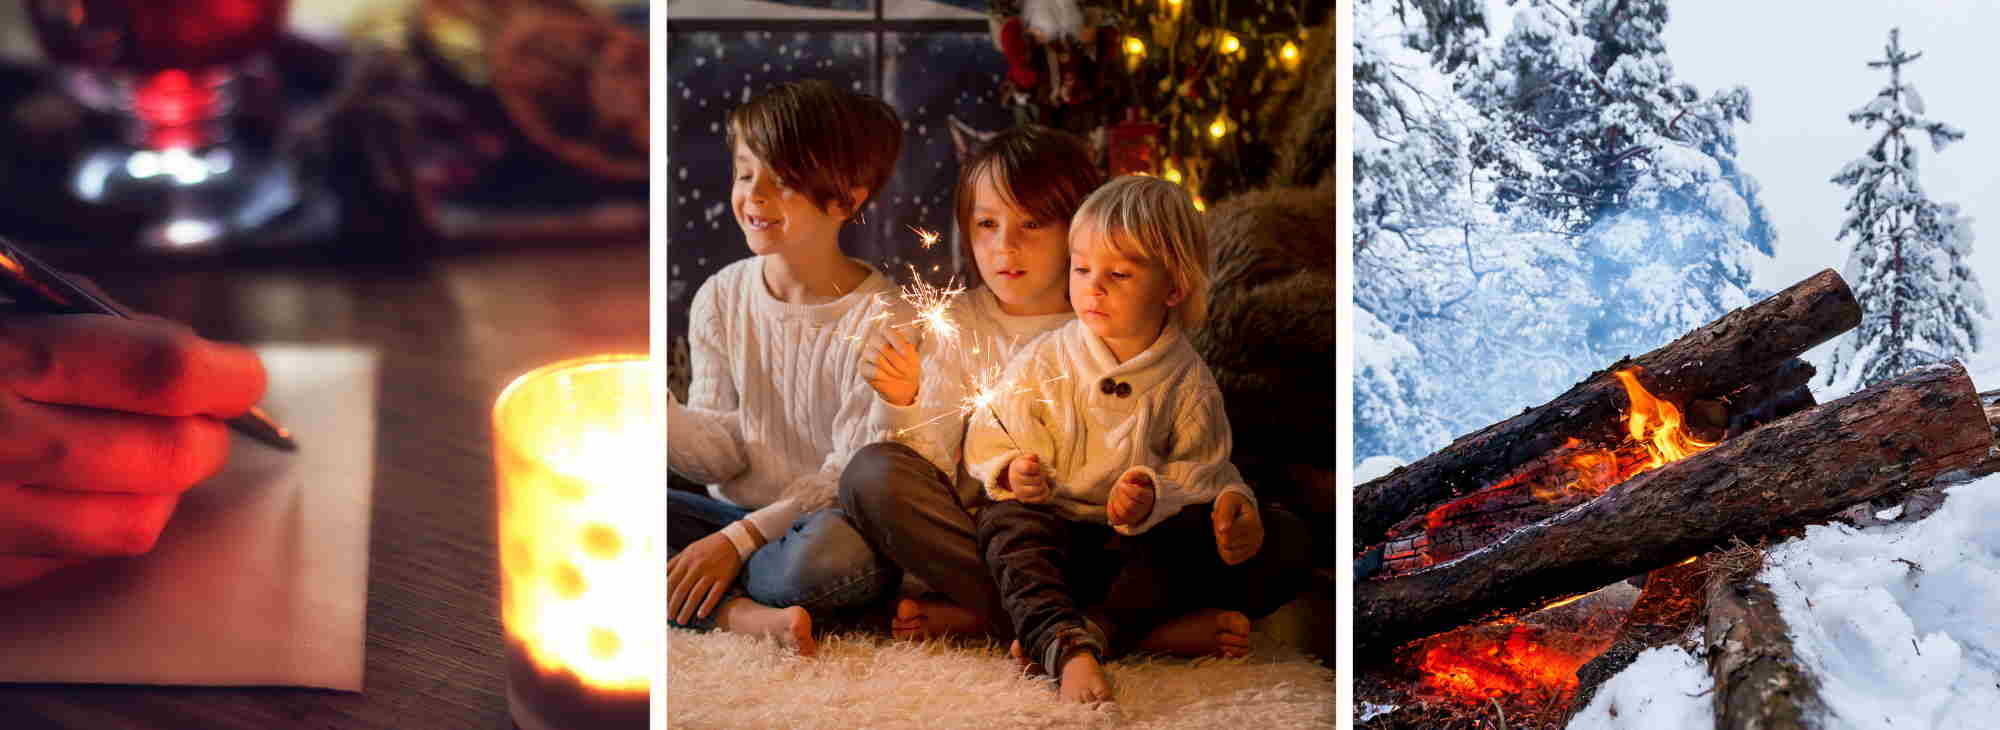 Silvester mit Kindern Traditionen